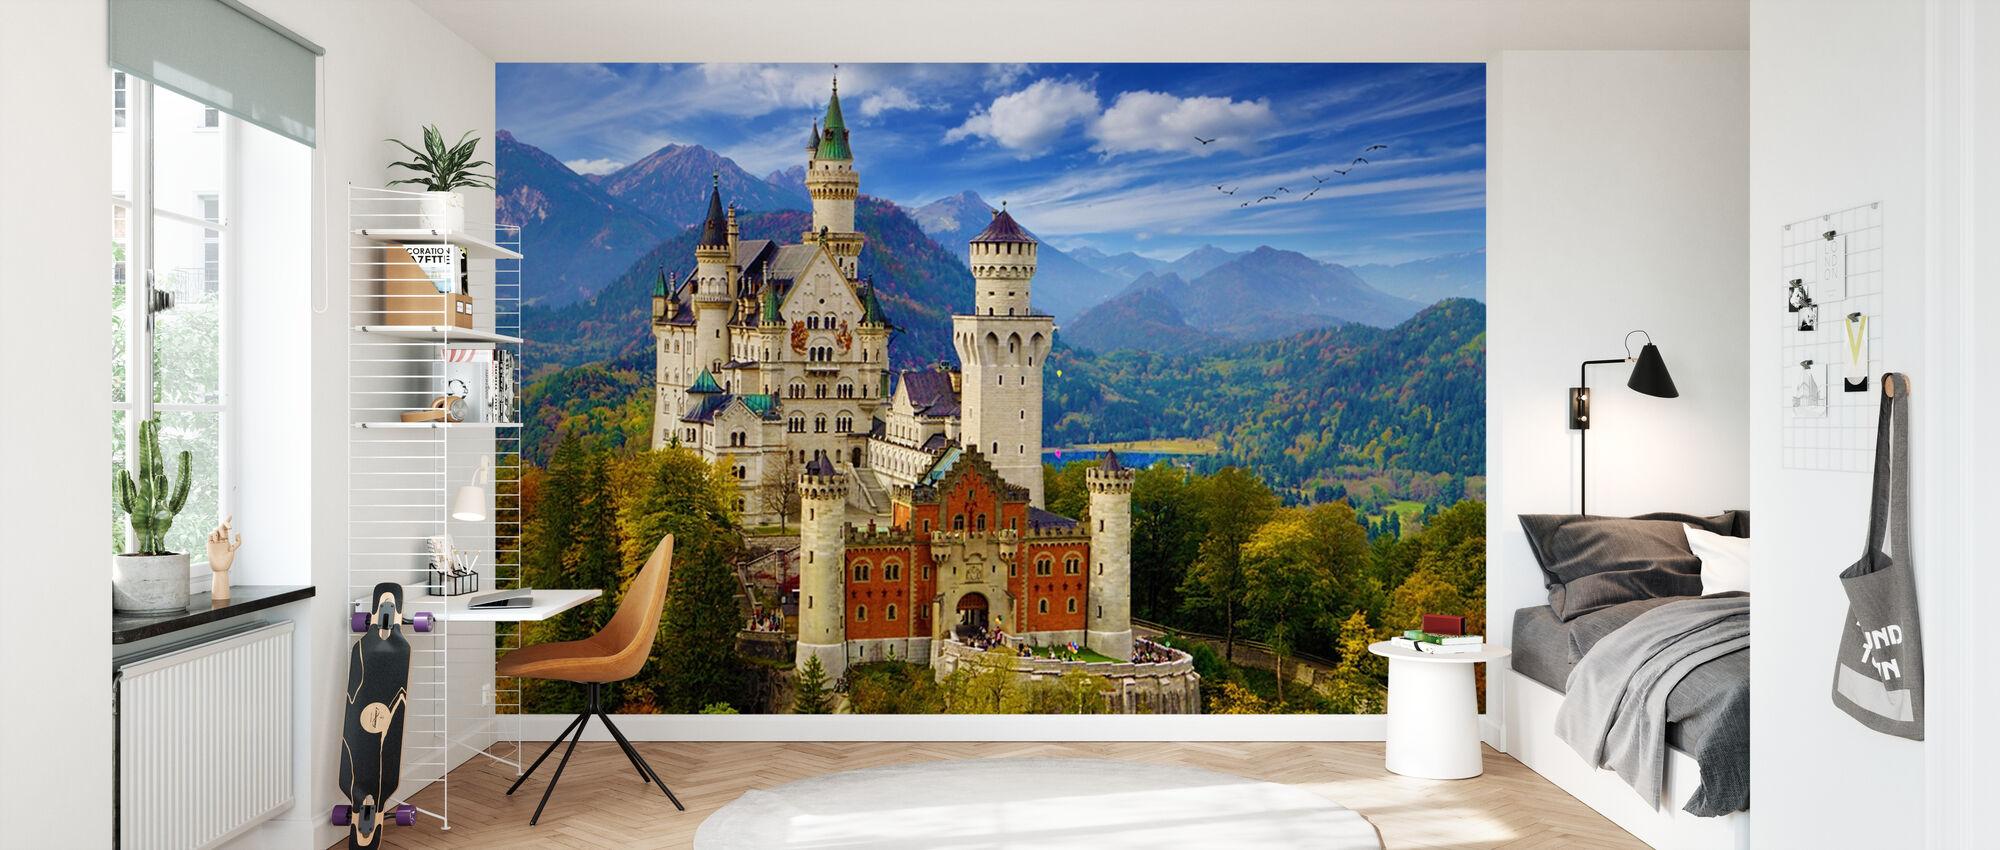 Neuschwanstein Castle - Wallpaper - Kids Room